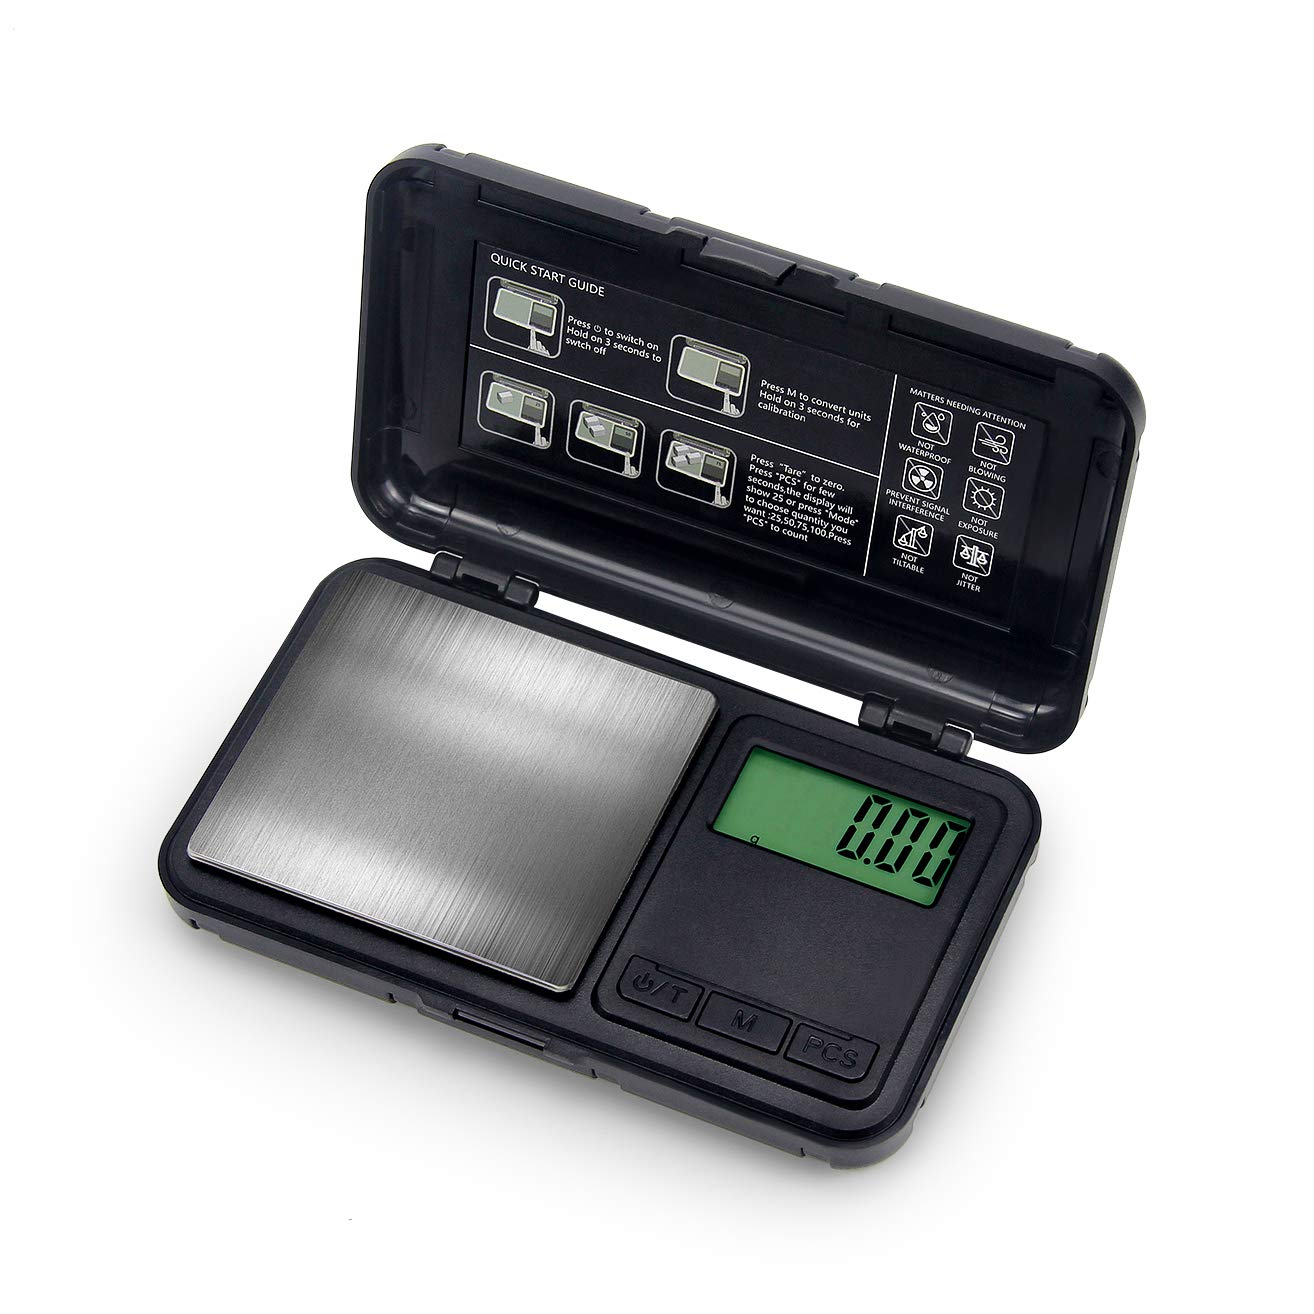 Digital Pocket Scale, Digital Grams Scale, Food Scale, Jewelry Scale Black, Kitchen Scale